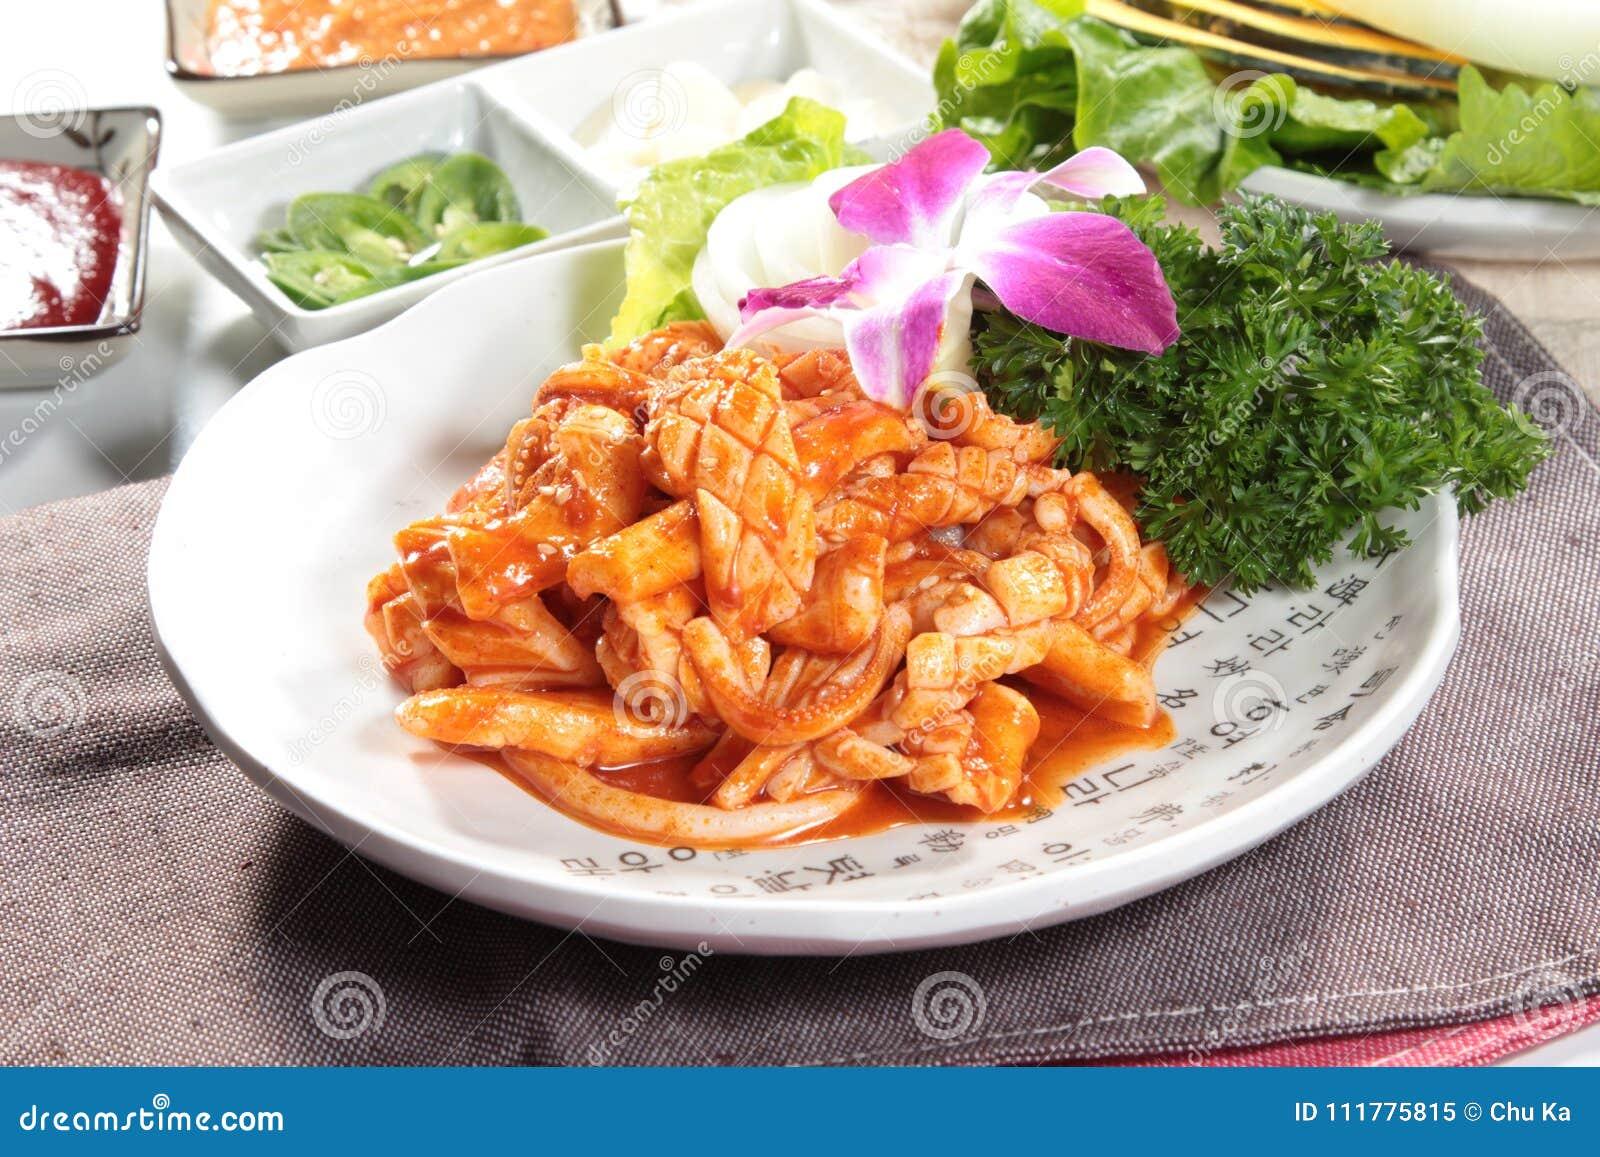 Fresh and tasty seafood cuisine